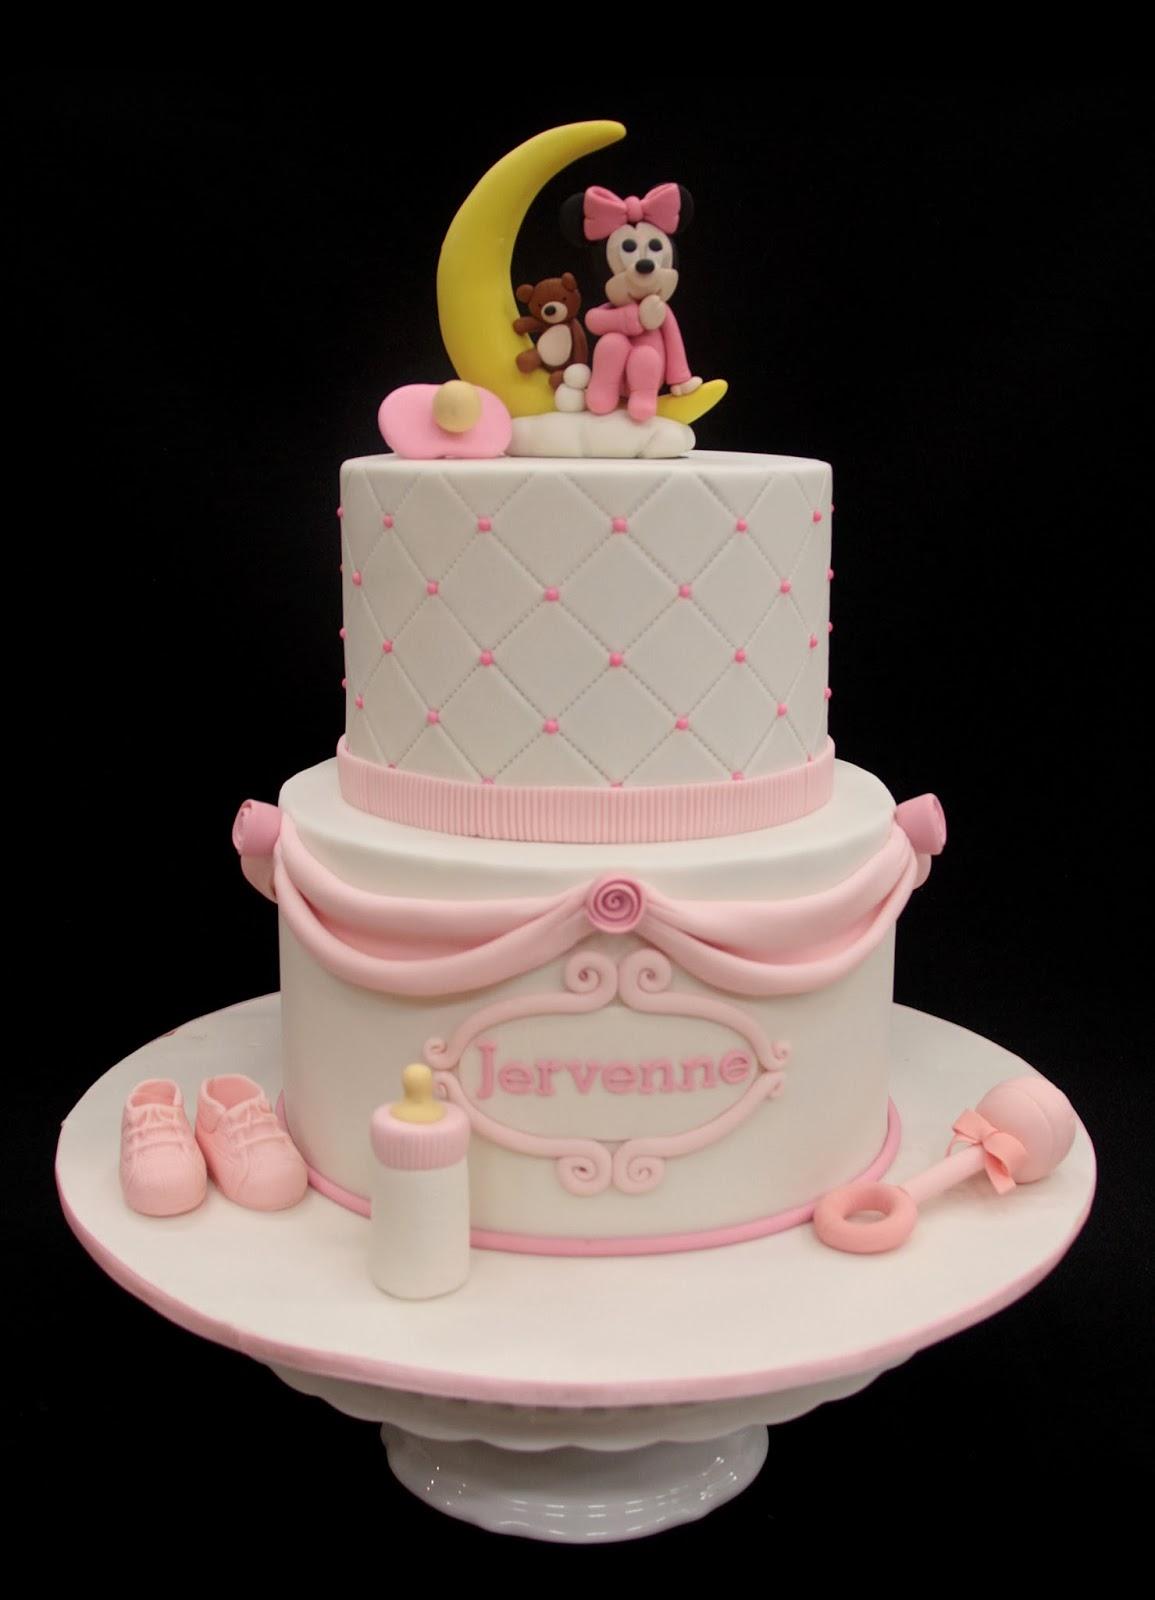 Penang Wedding Cakes by Leesin: Baby Minnie Baby Cake